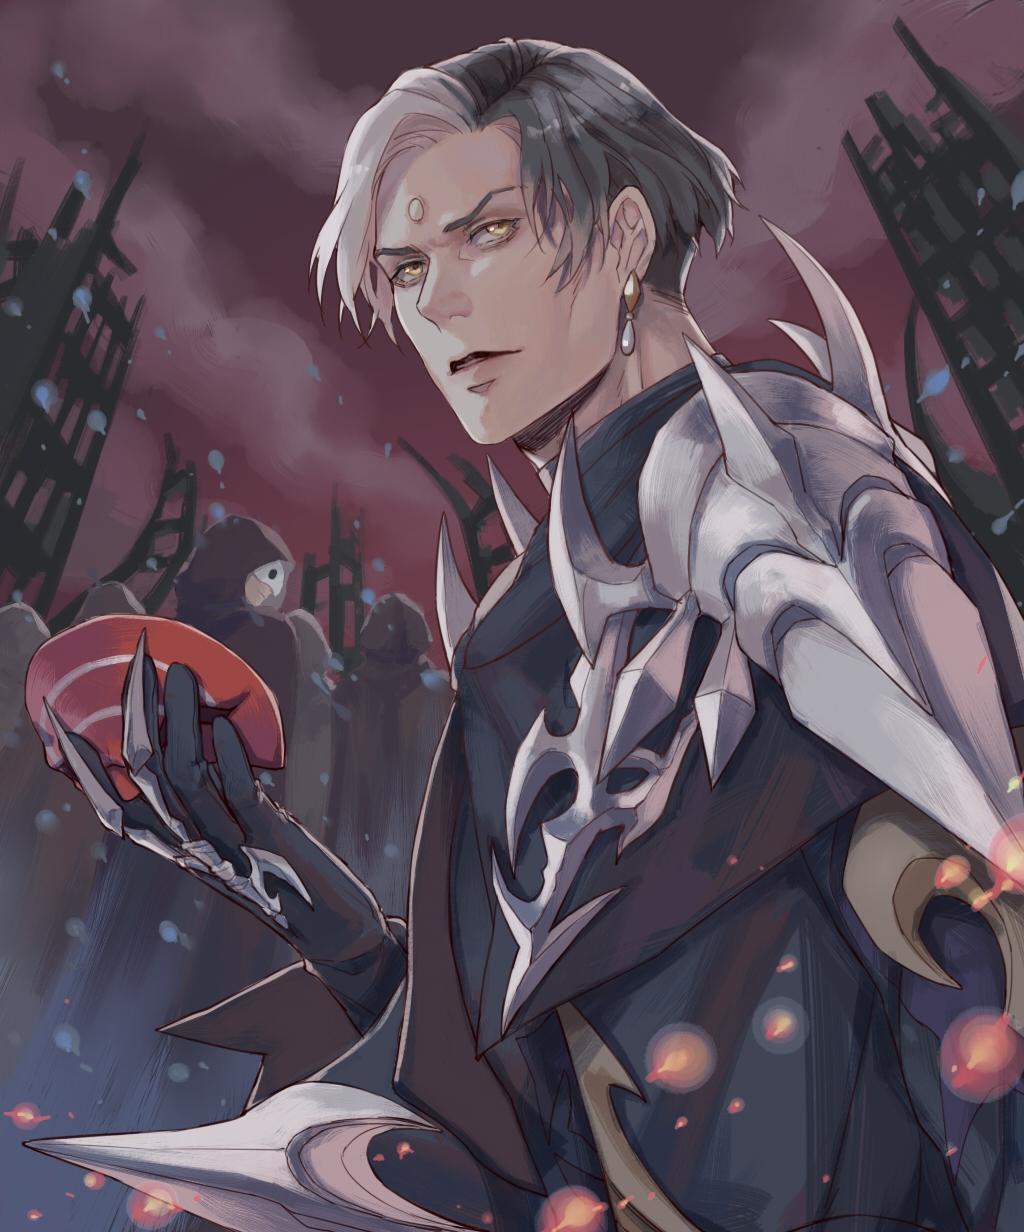 Garlean And Emet Selch Final Fantasy And 1 More Drawn By Kaze 0 Danbooru Listen to emet selch in full in the spotify app. garlean and emet selch final fantasy